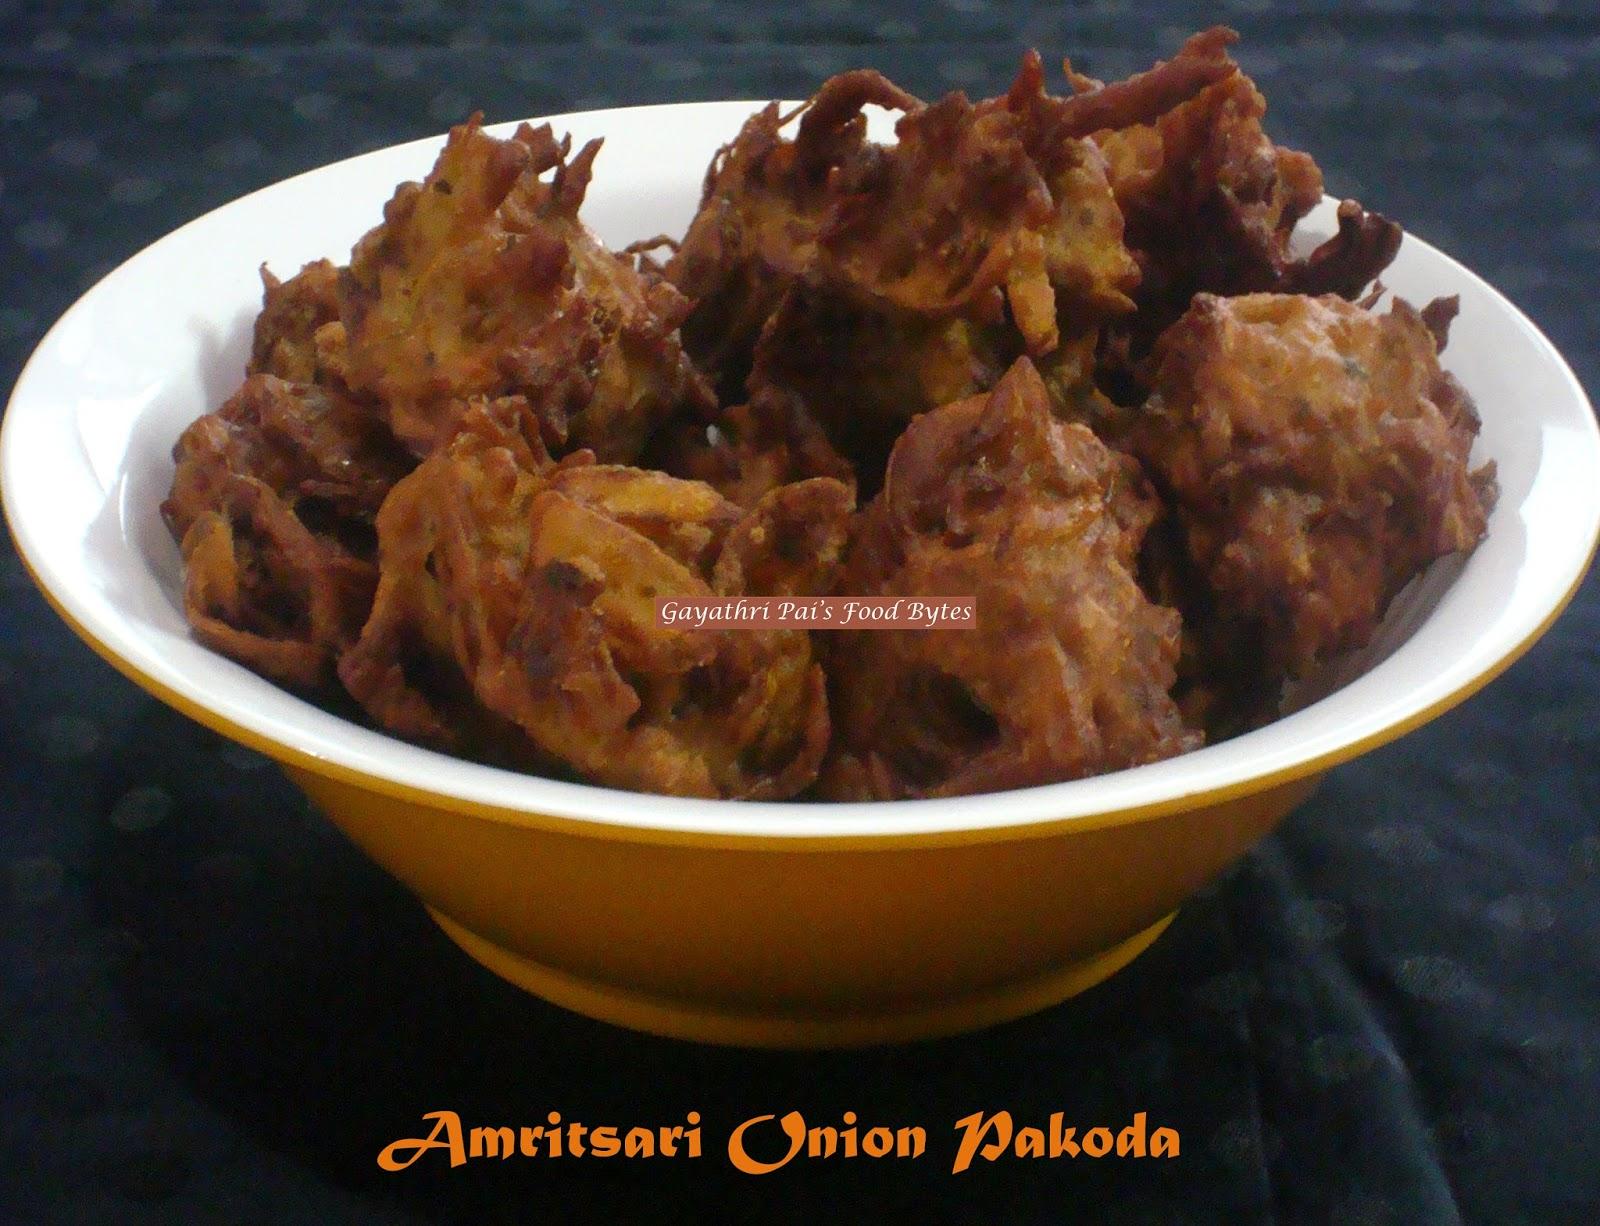 Gayathri pai 39 s food bytes amritsari onion pakoda for Amritsari cuisine